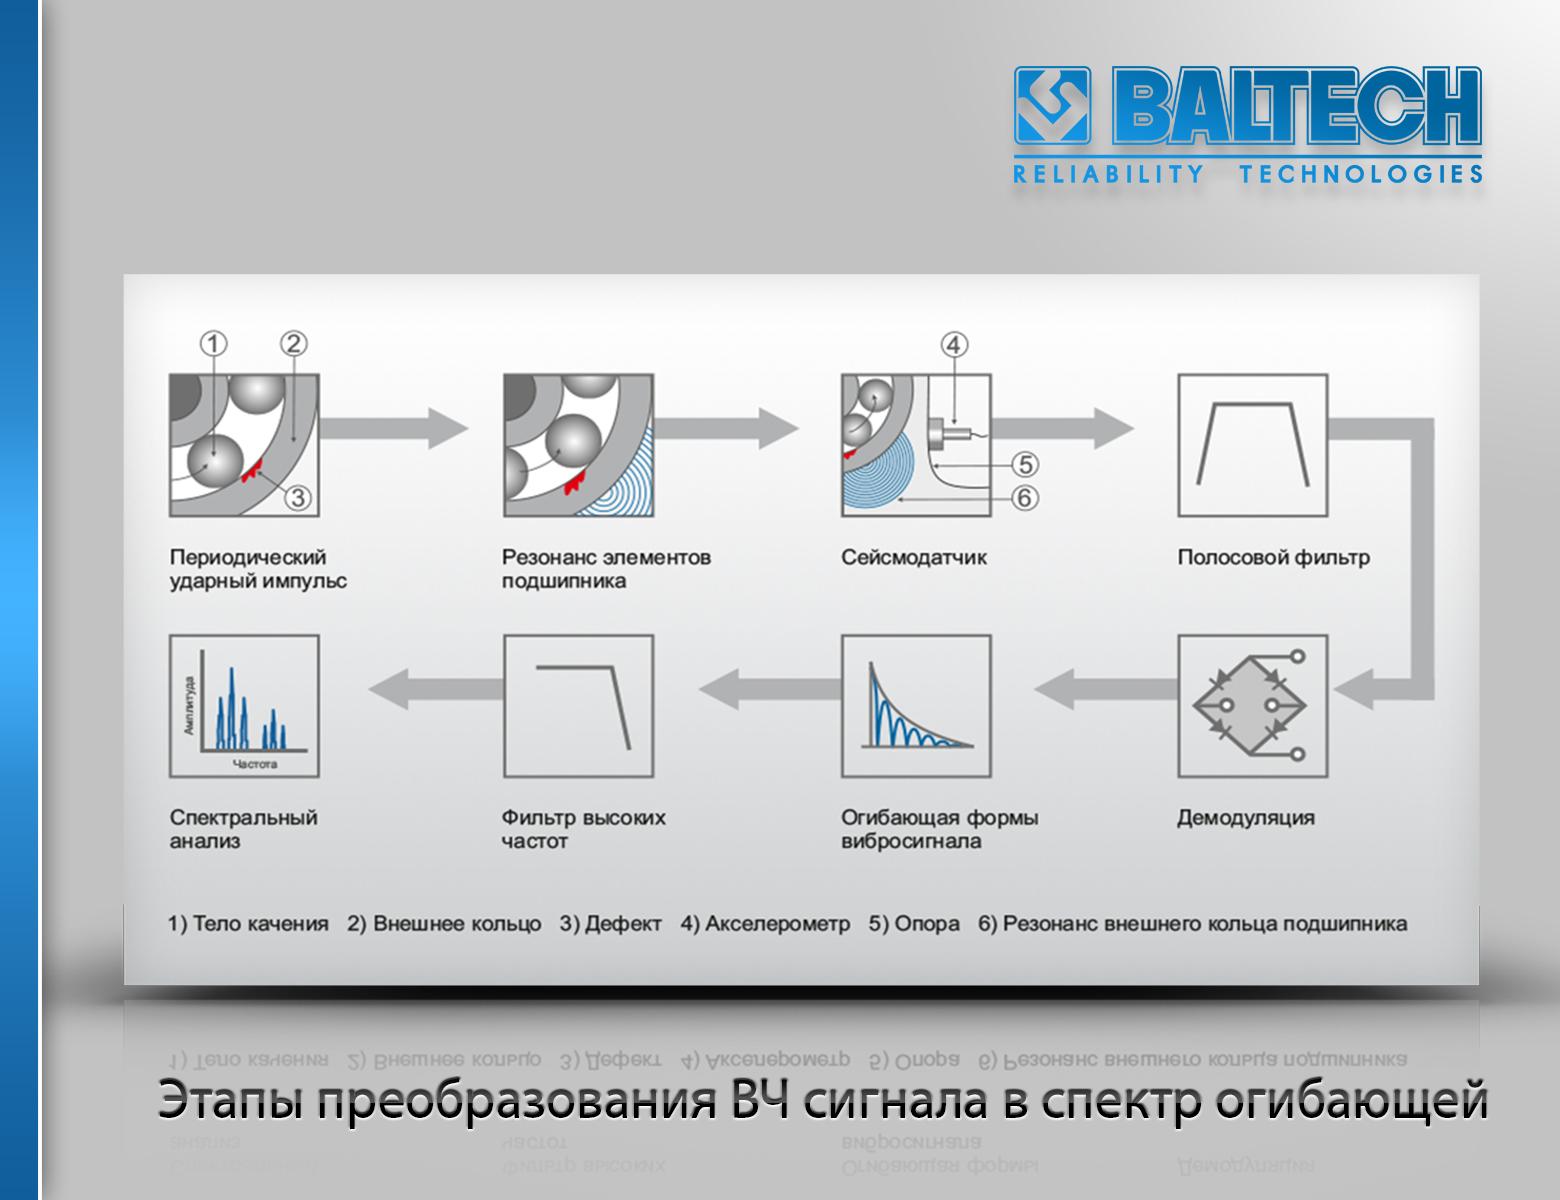 Спектр огибающей, метод огибающей, метод вибродиагностики, виброанализаторы